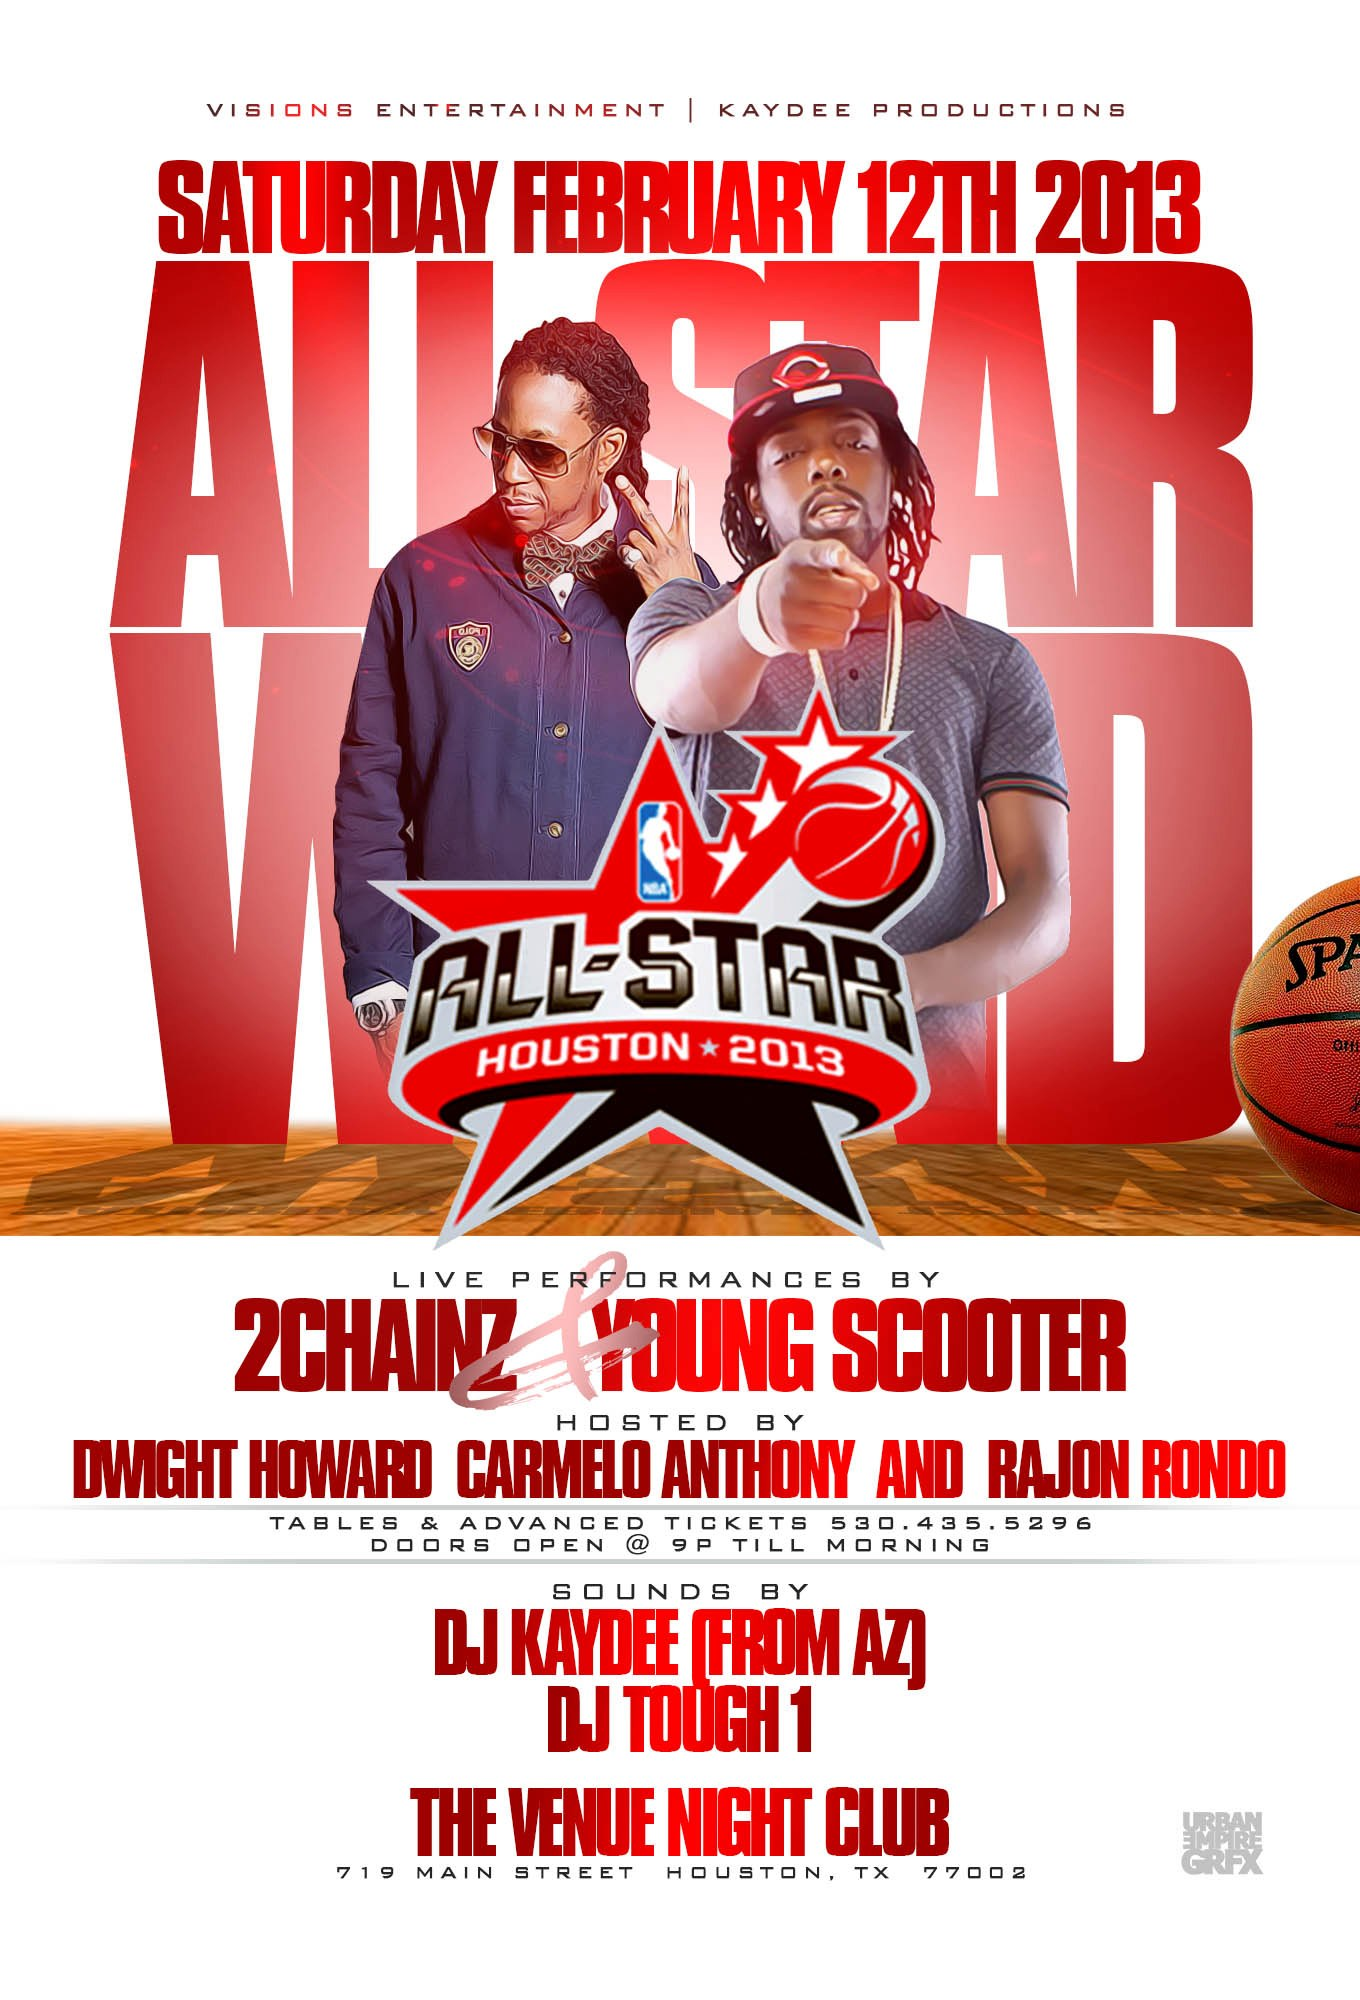 All Star 2013 Flyer